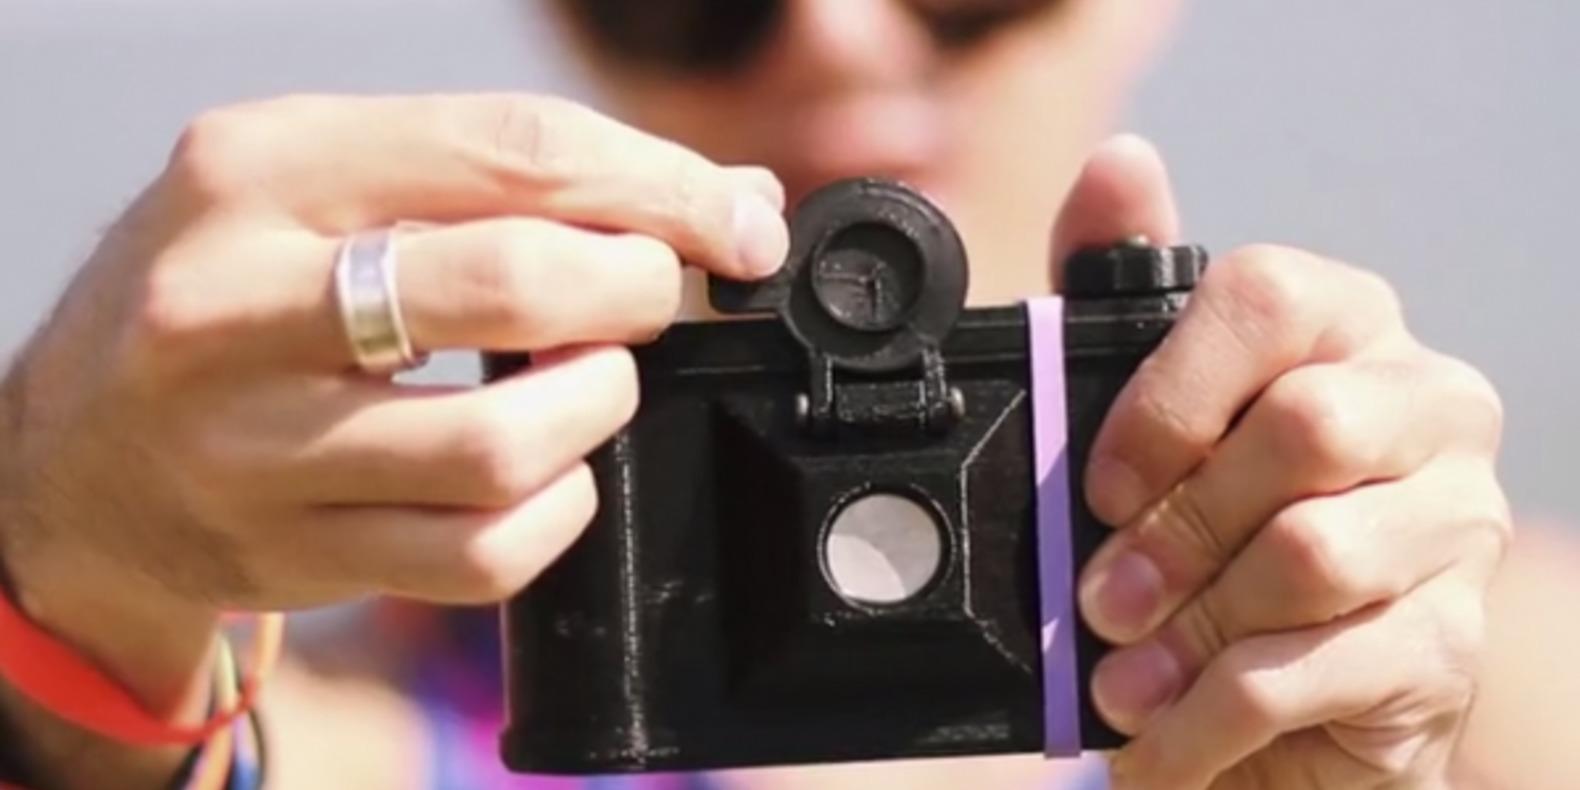 http://fichier3d.fr/wp-content/uploads/2013/10/sténopé-camera-obscura-pinhole-camera-3D-printed-impression-3D-fichier-3D-STL-clint-oconnor-cults-3D-cults-designer-1-e1382003947497.png